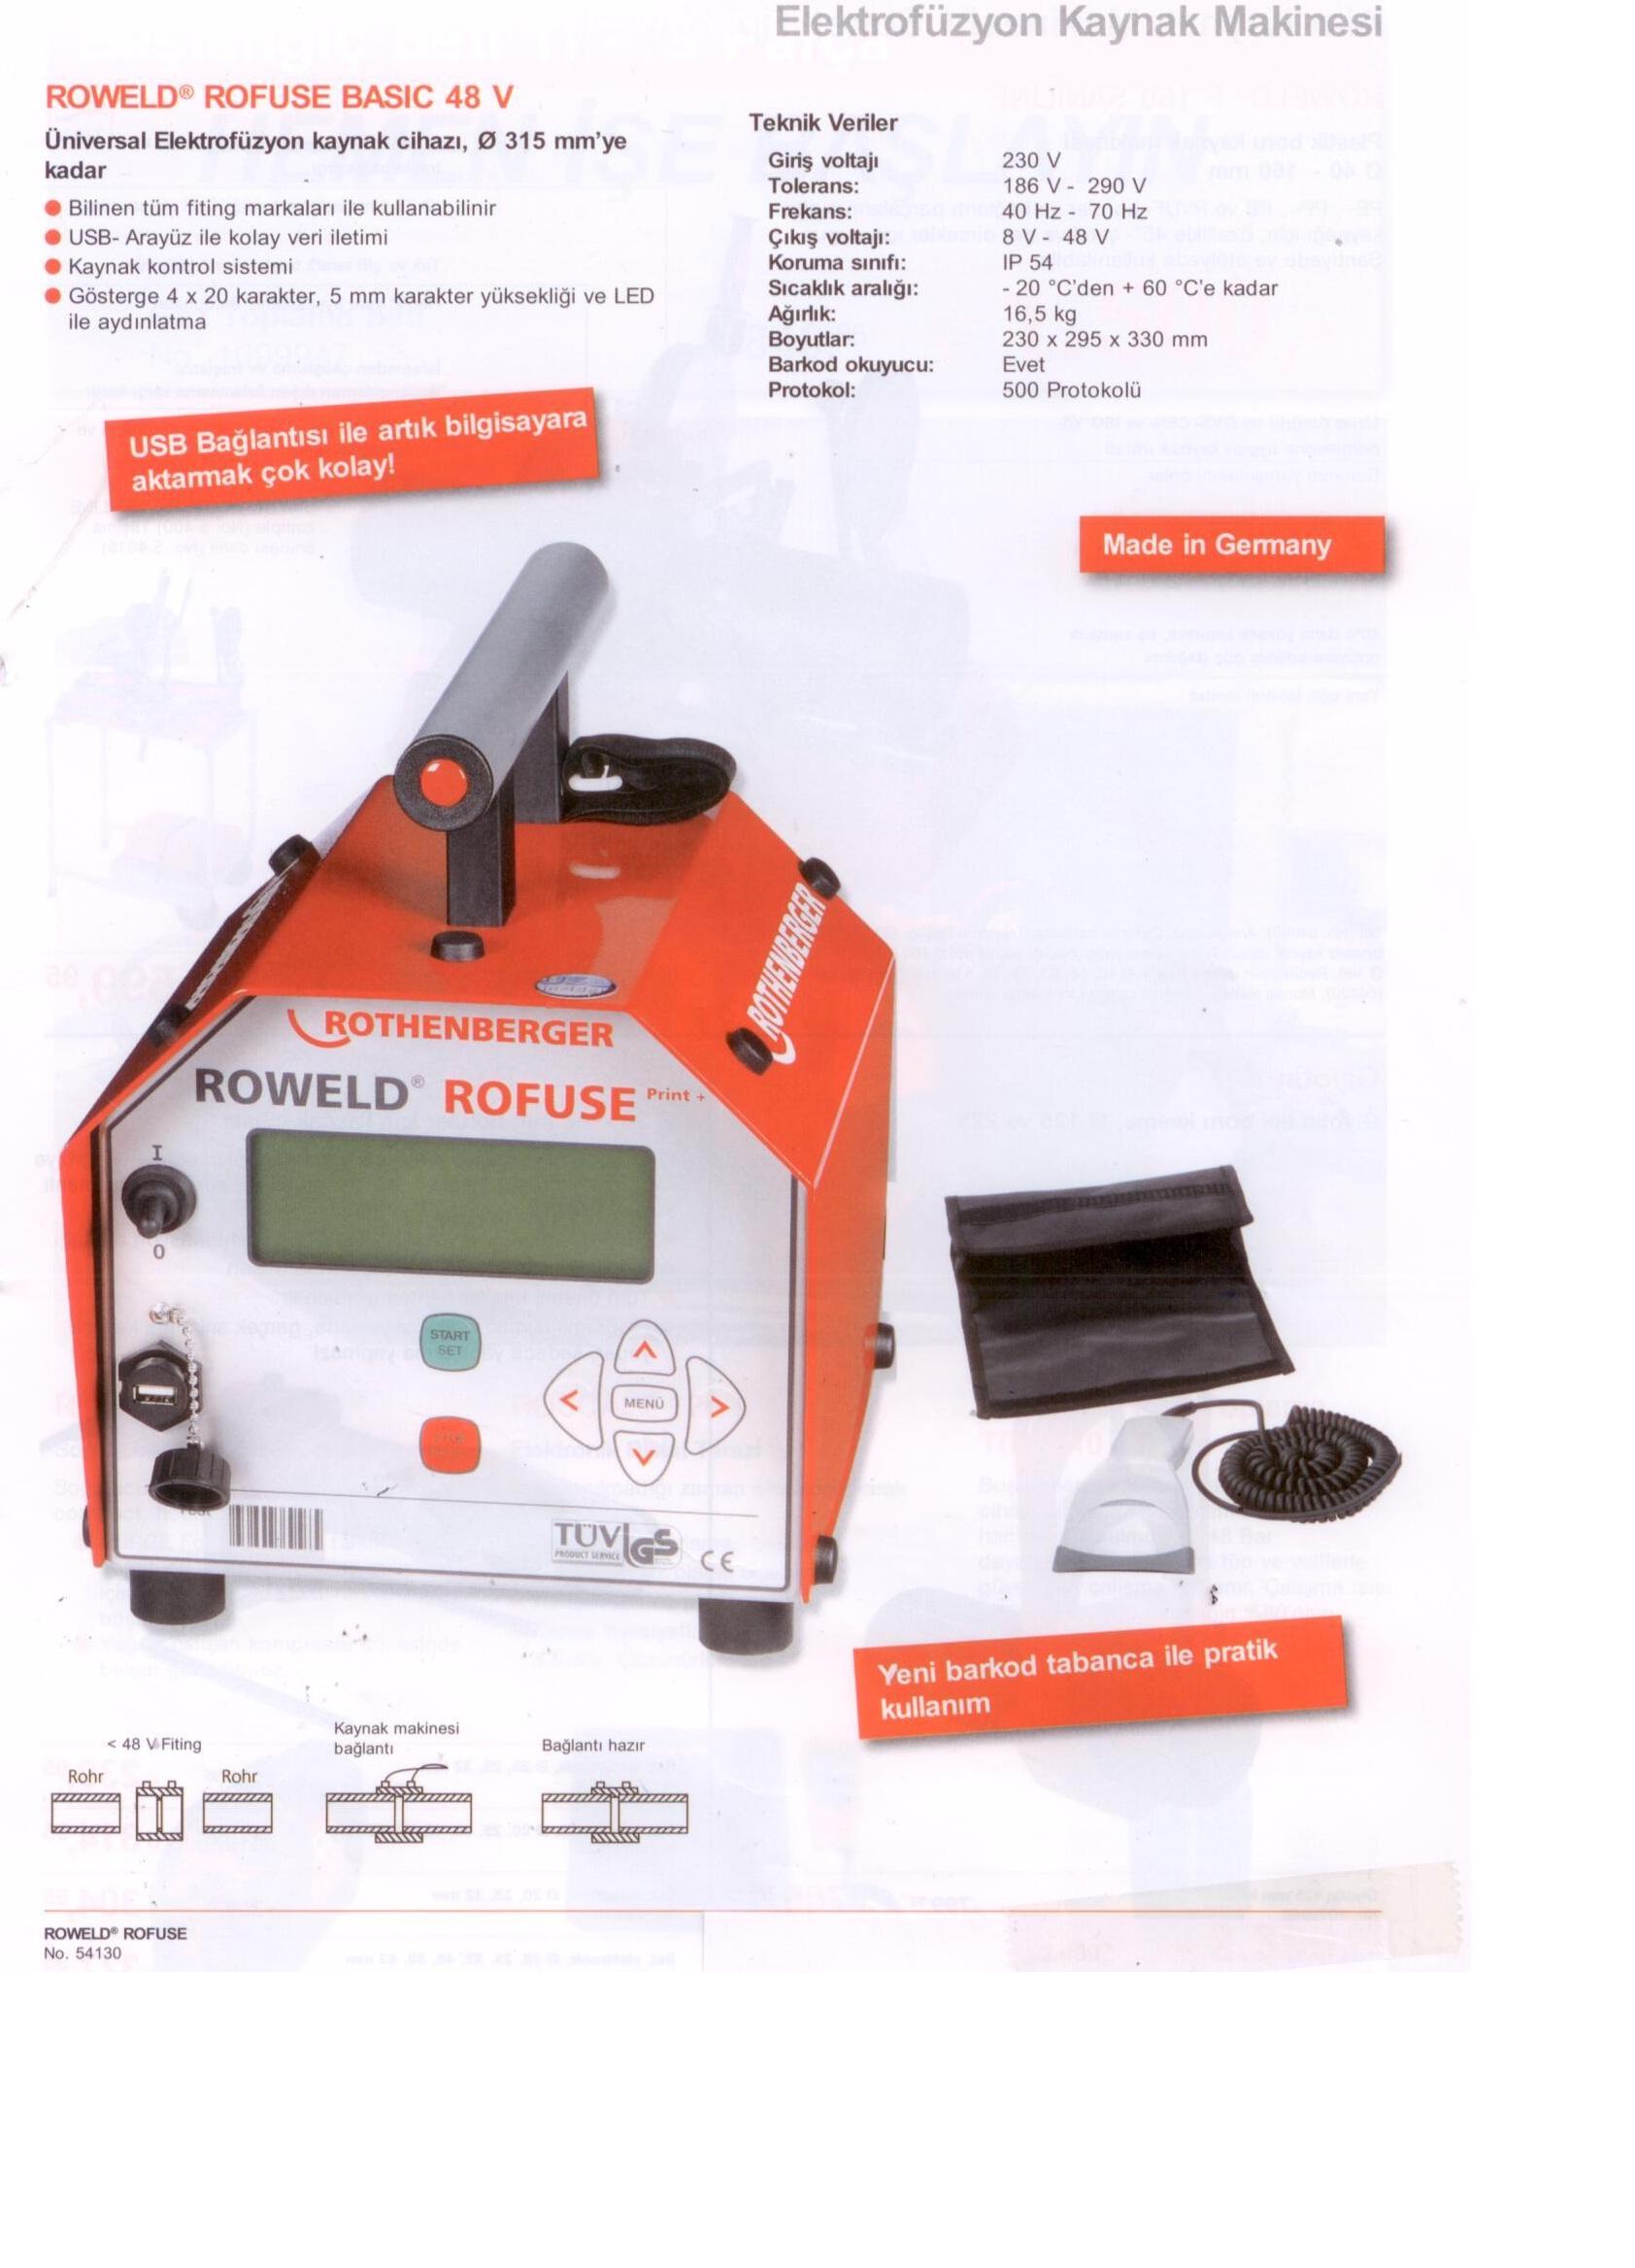 ROWELD ROFUSE BASIC 48V KAMPANYA ROTHENBERGER ELEKTROFÜZYON KAYNAK MAKİNASI